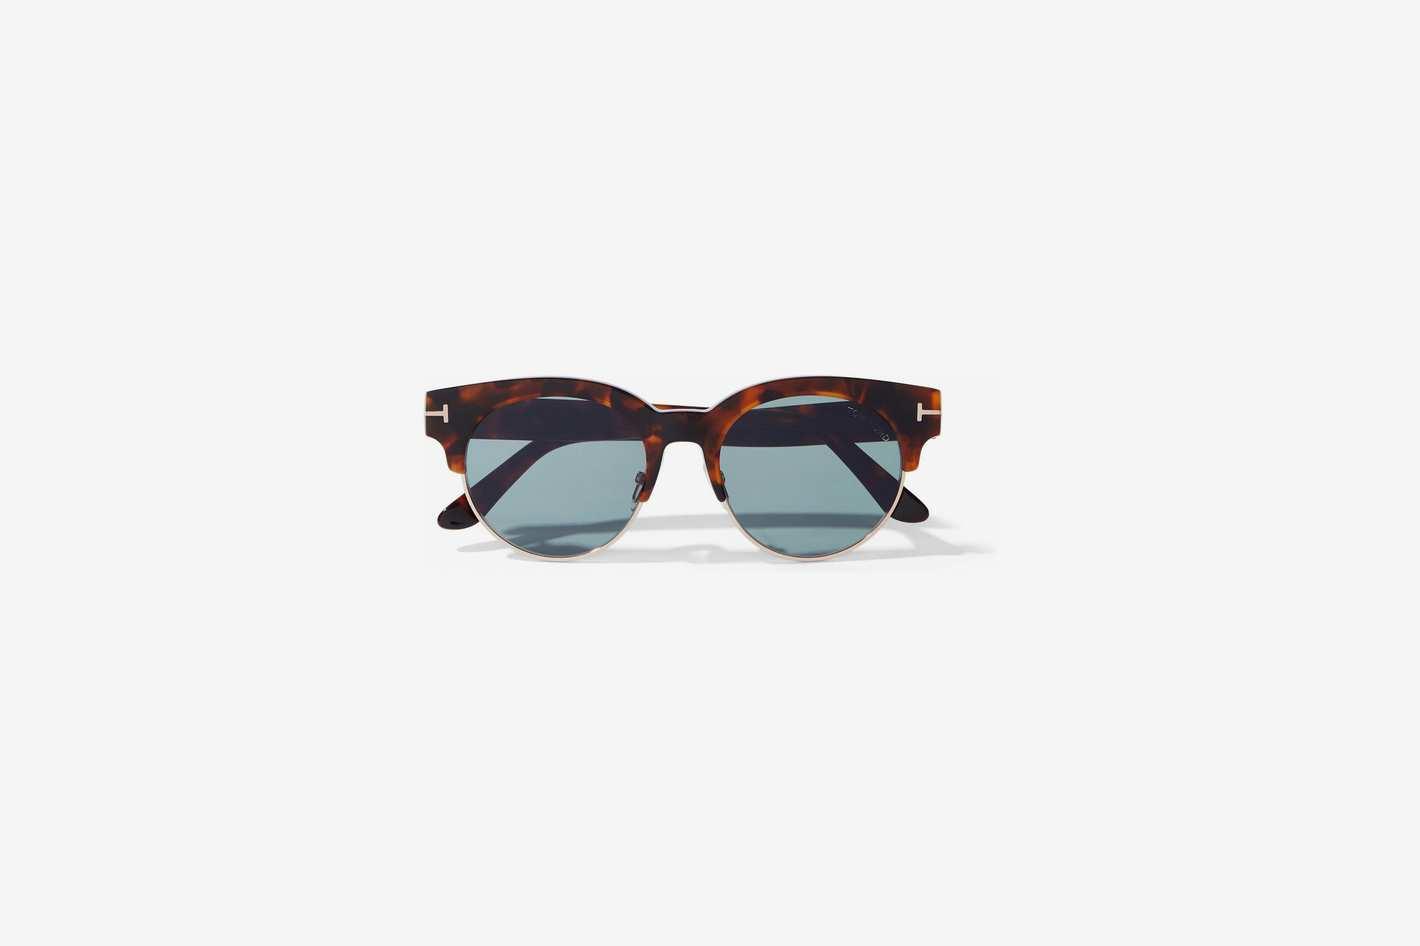 cef74c1f1 Tom Ford D-frame Tortoiseshell Acetate and Gold-tone Sunglasses